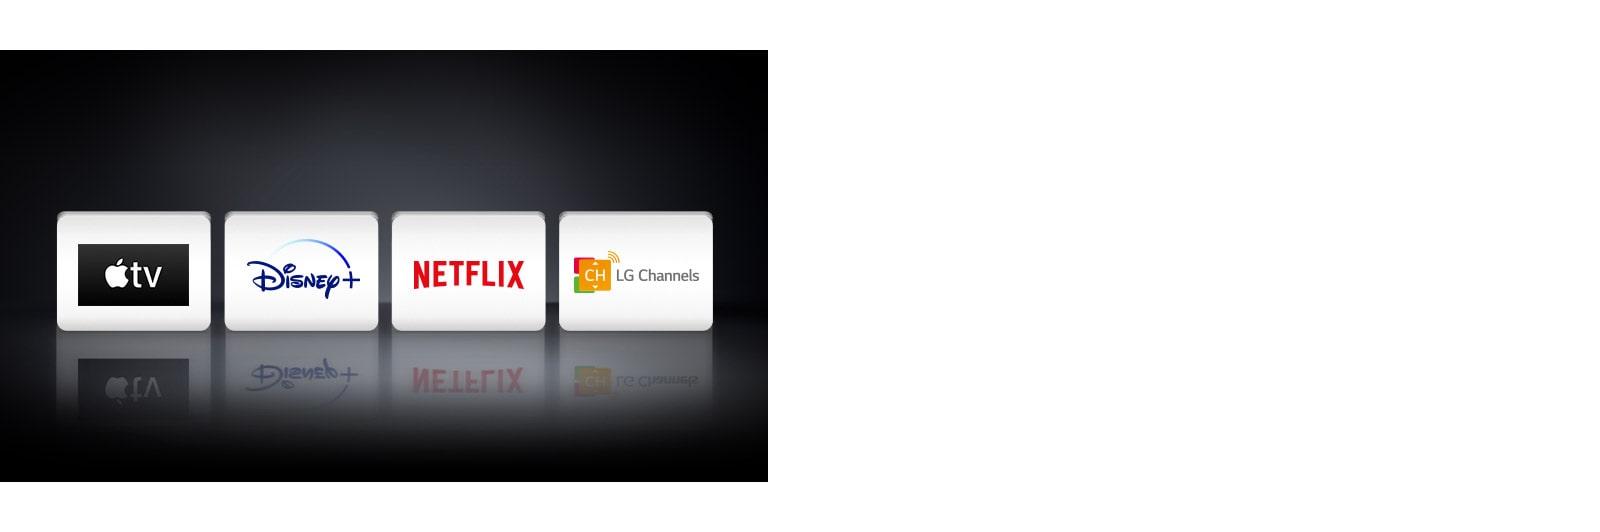 Quattro loghi: app Apple TV, Disney +, Netflix e canali LG